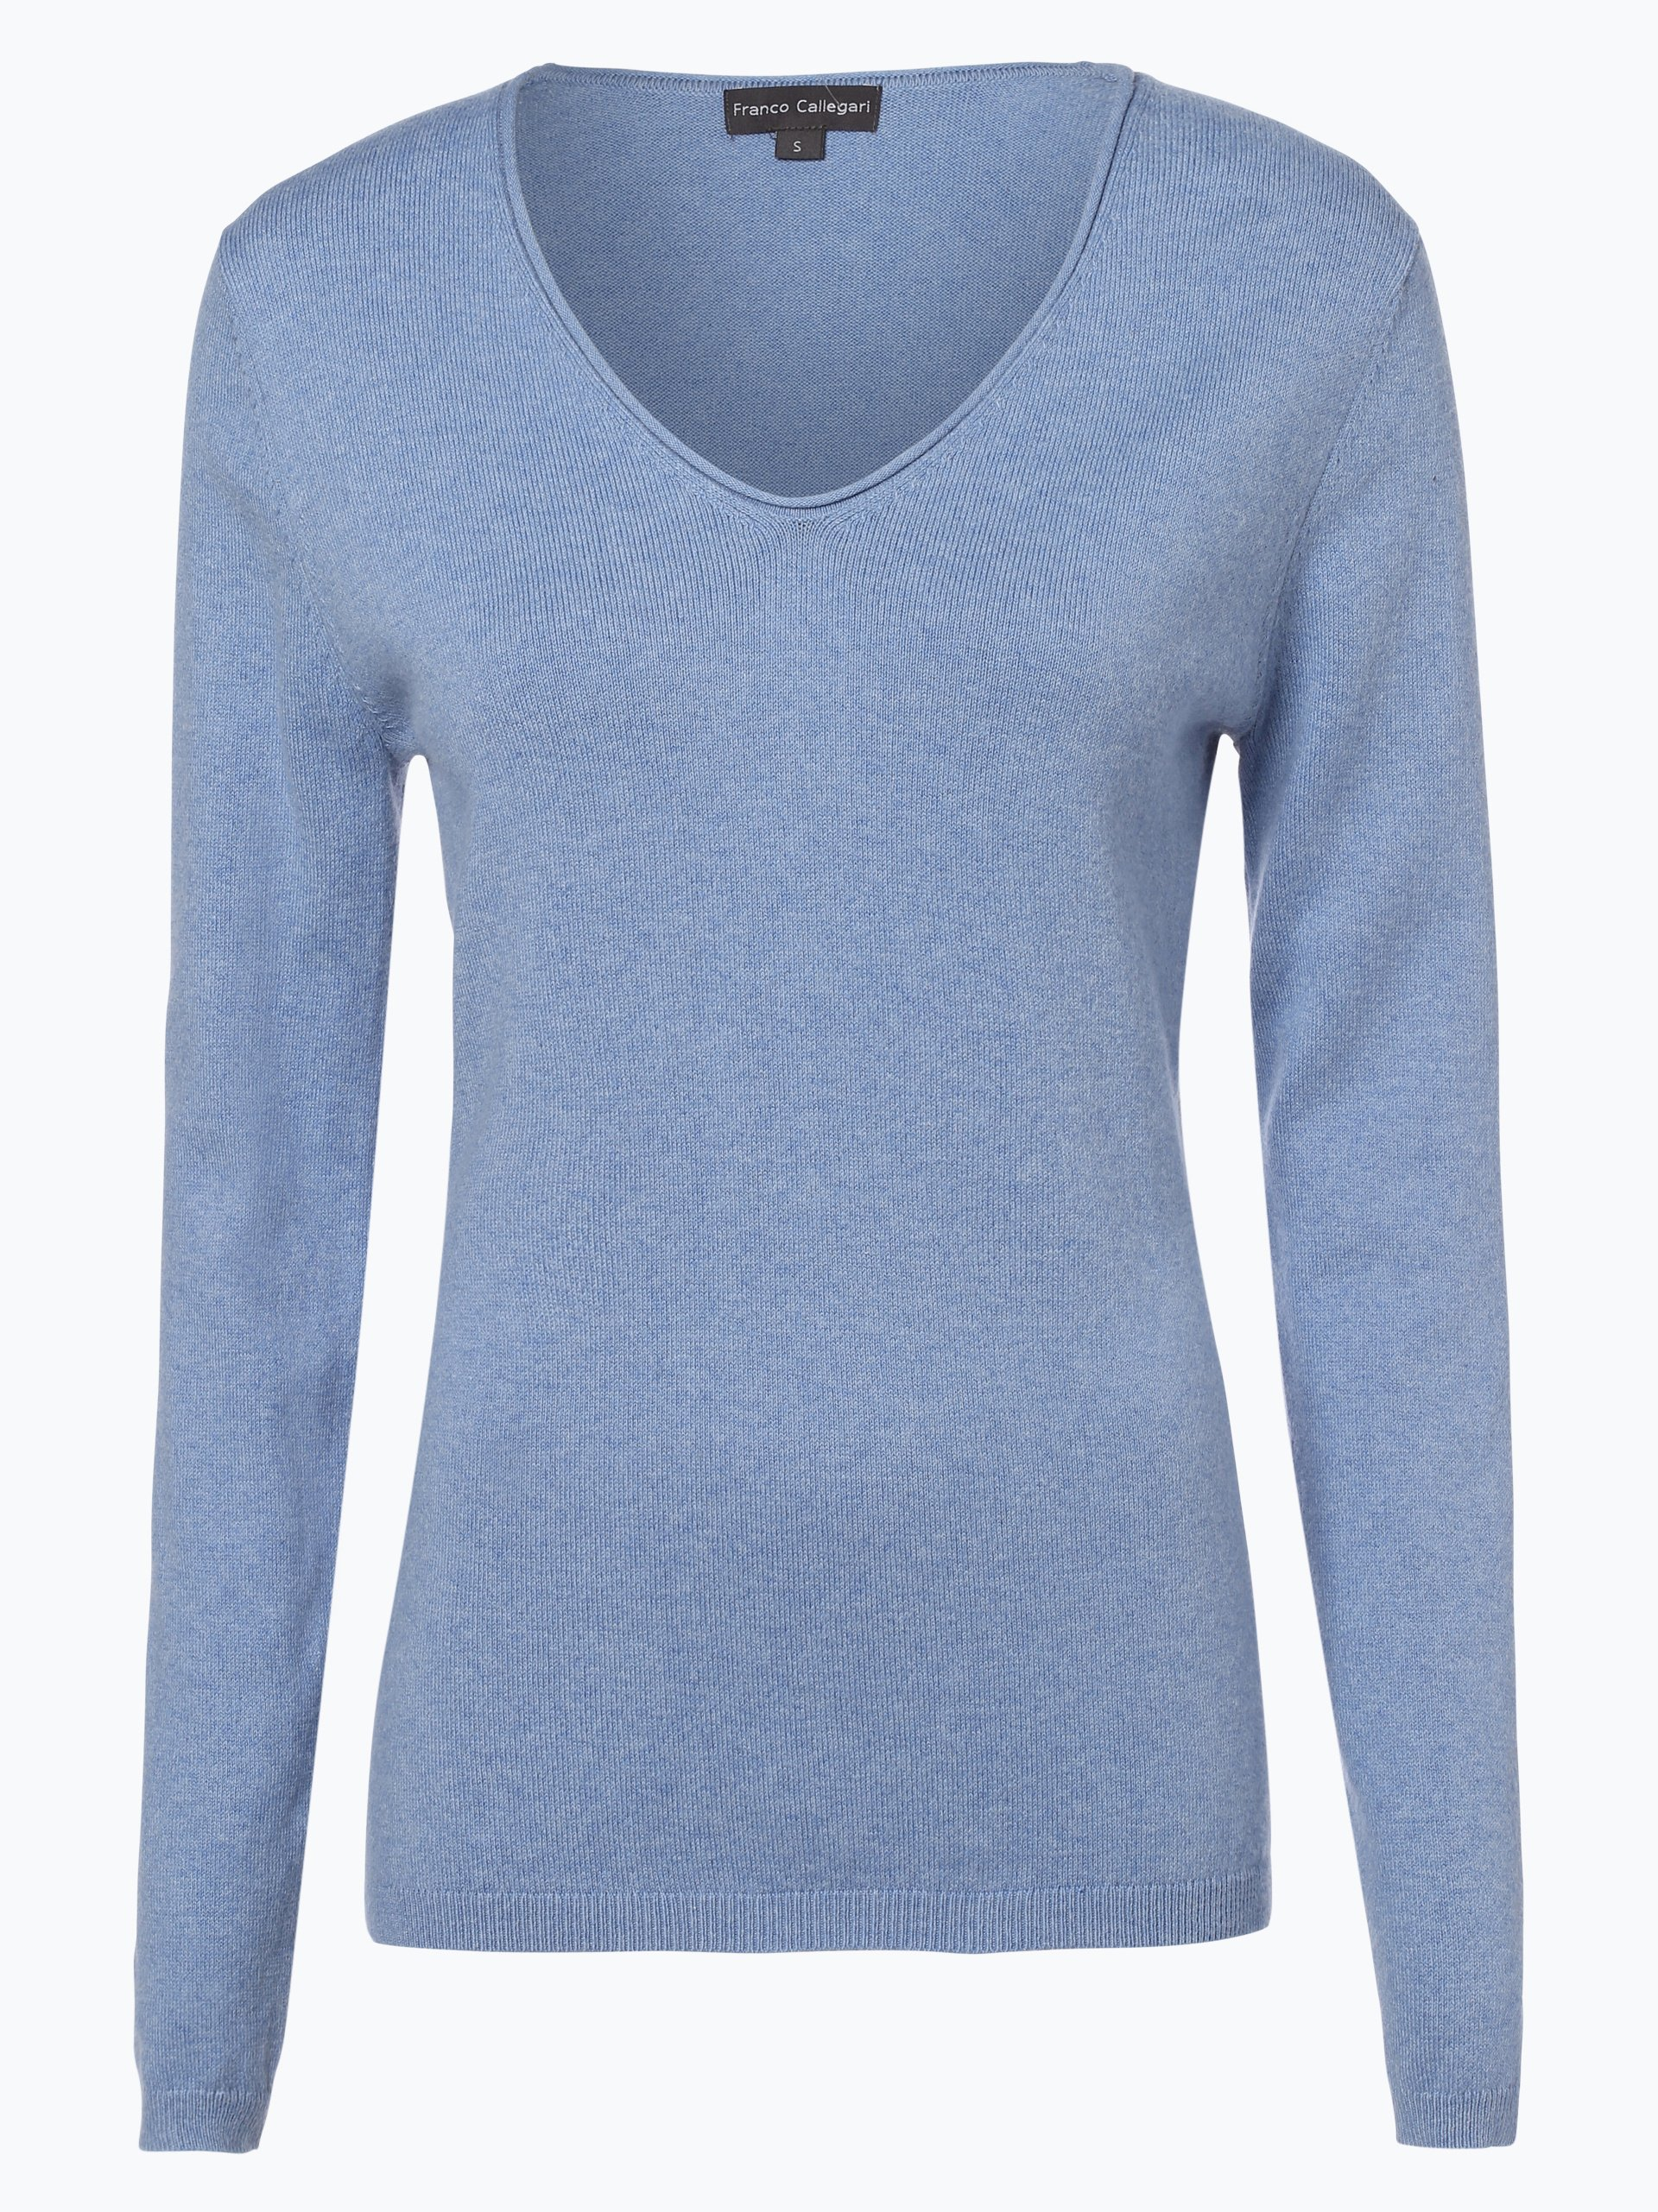 franco callegari damen pullover mit cashmere anteil blau. Black Bedroom Furniture Sets. Home Design Ideas